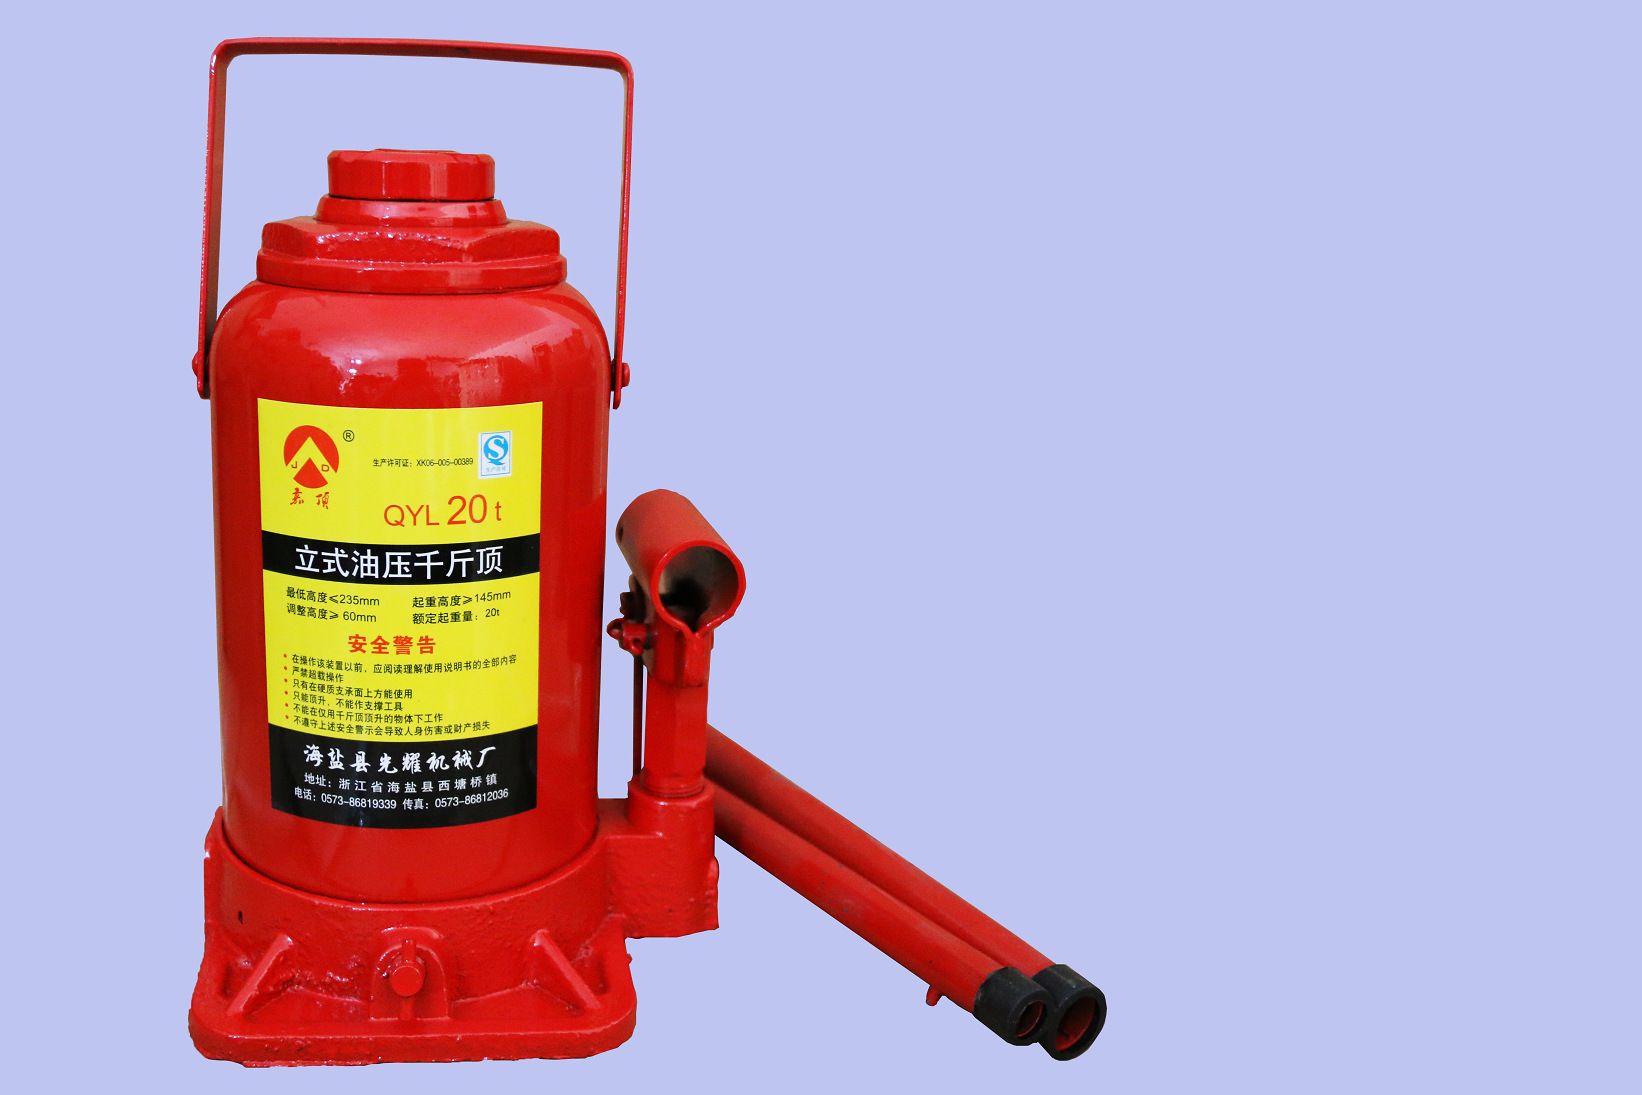 Supply Lifting Jack QYL 20T Hydraulic Vertical Jack 20 Tons Guarantee Quality Light 20 Tons